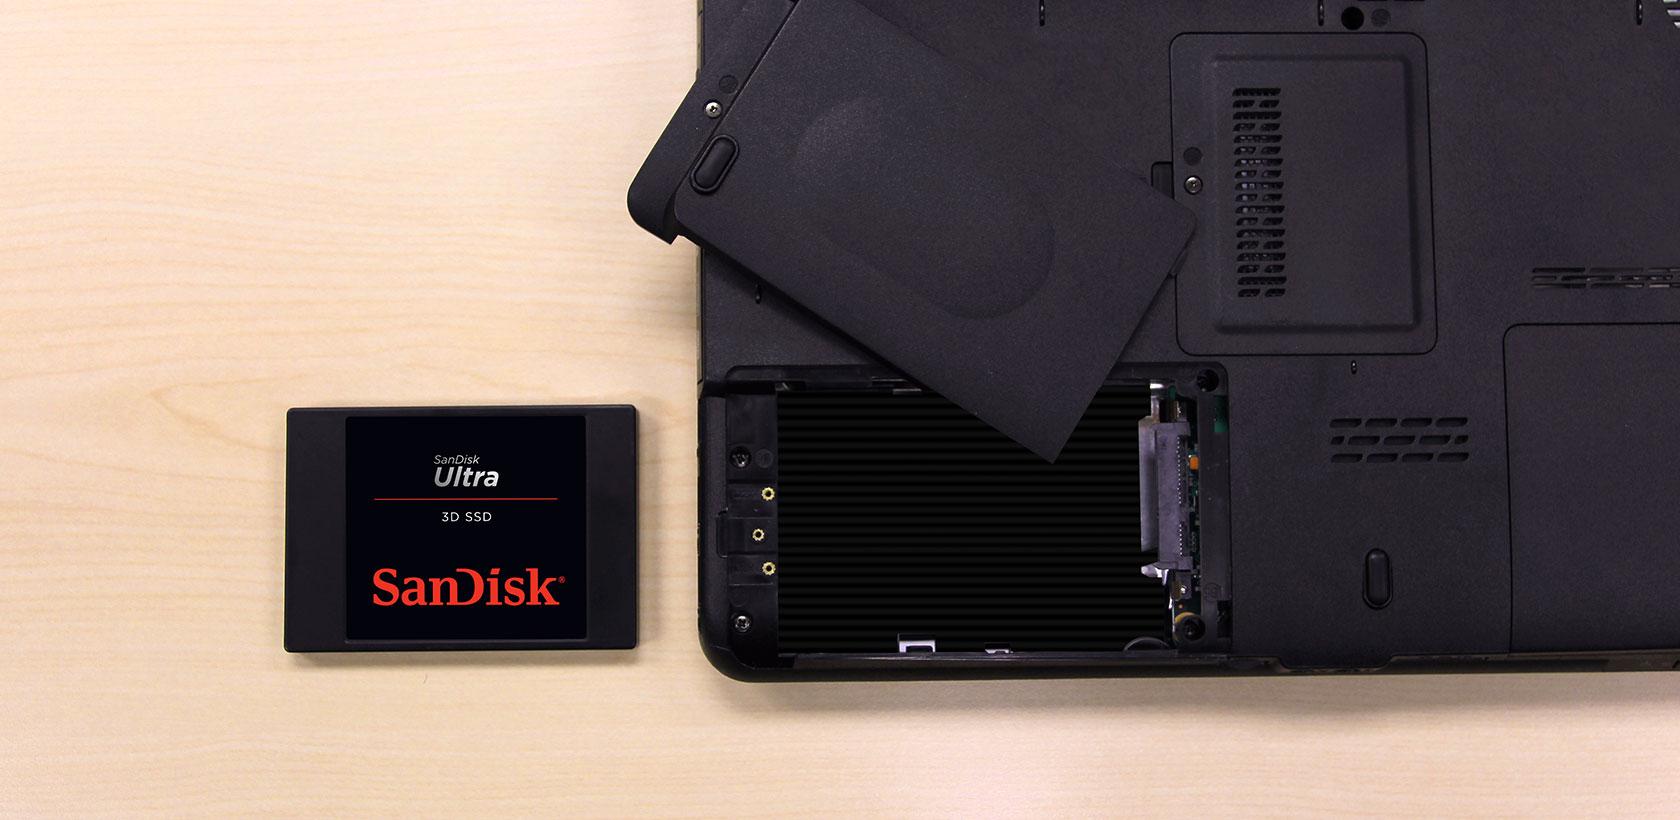 2.5//7mm SDSSDH3-250G-G25 SanDisk Ultra 3D NAND 250GB Internal SSD SATA III 6 Gb//s